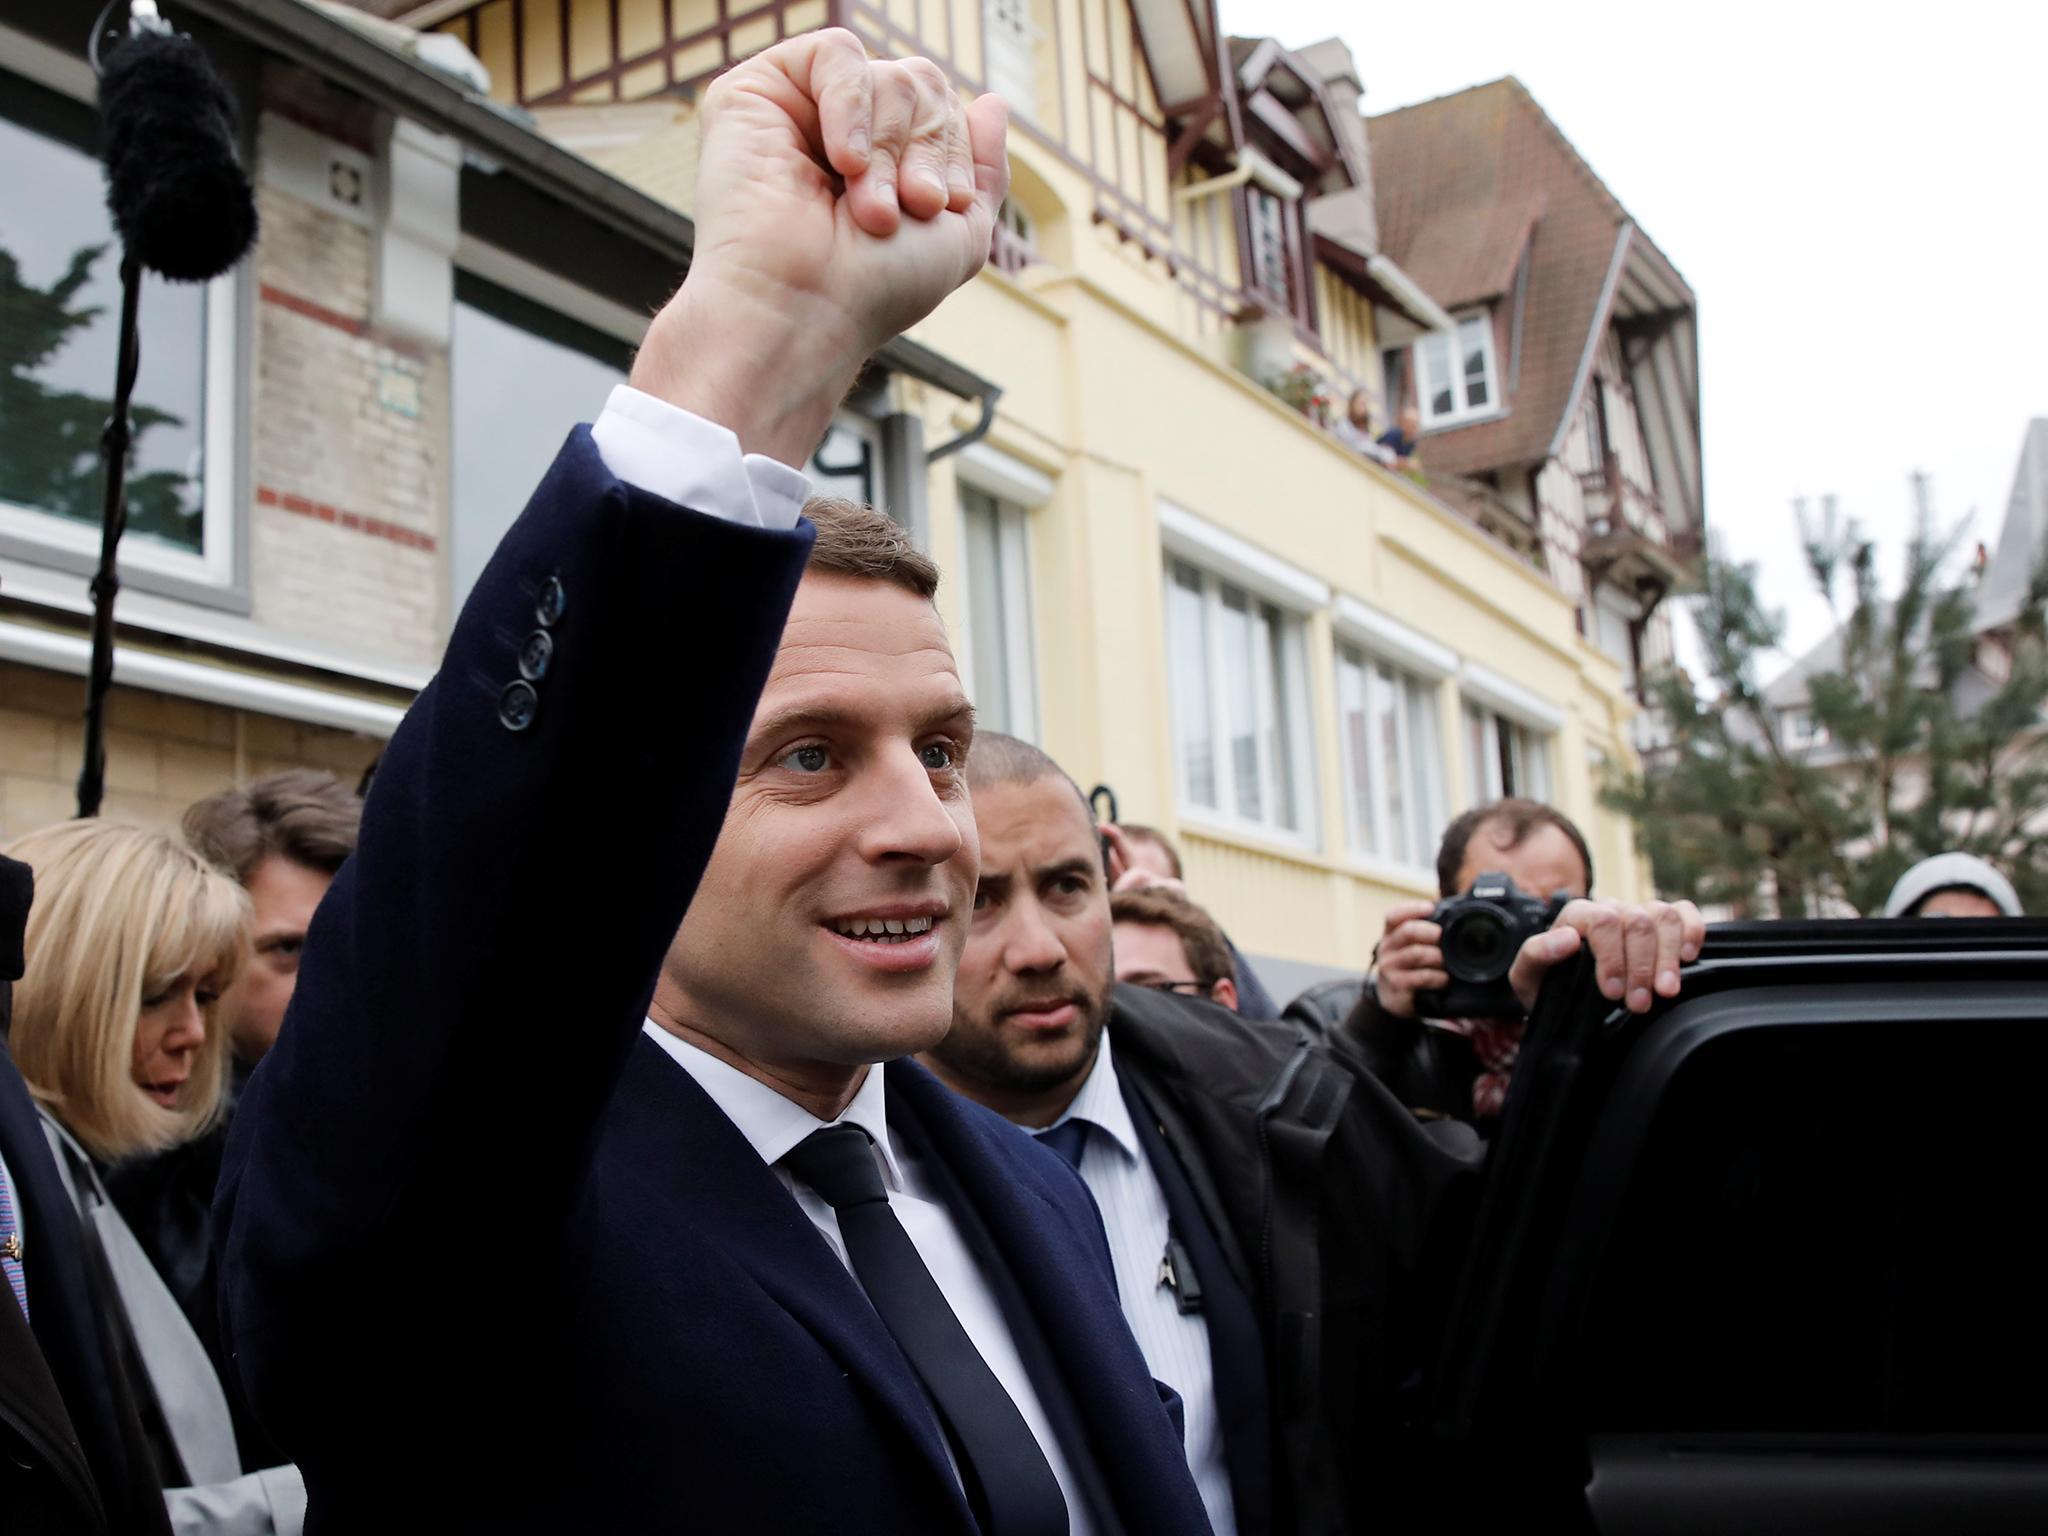 Emmanuel Macron claims Africa held back by 'civilisational